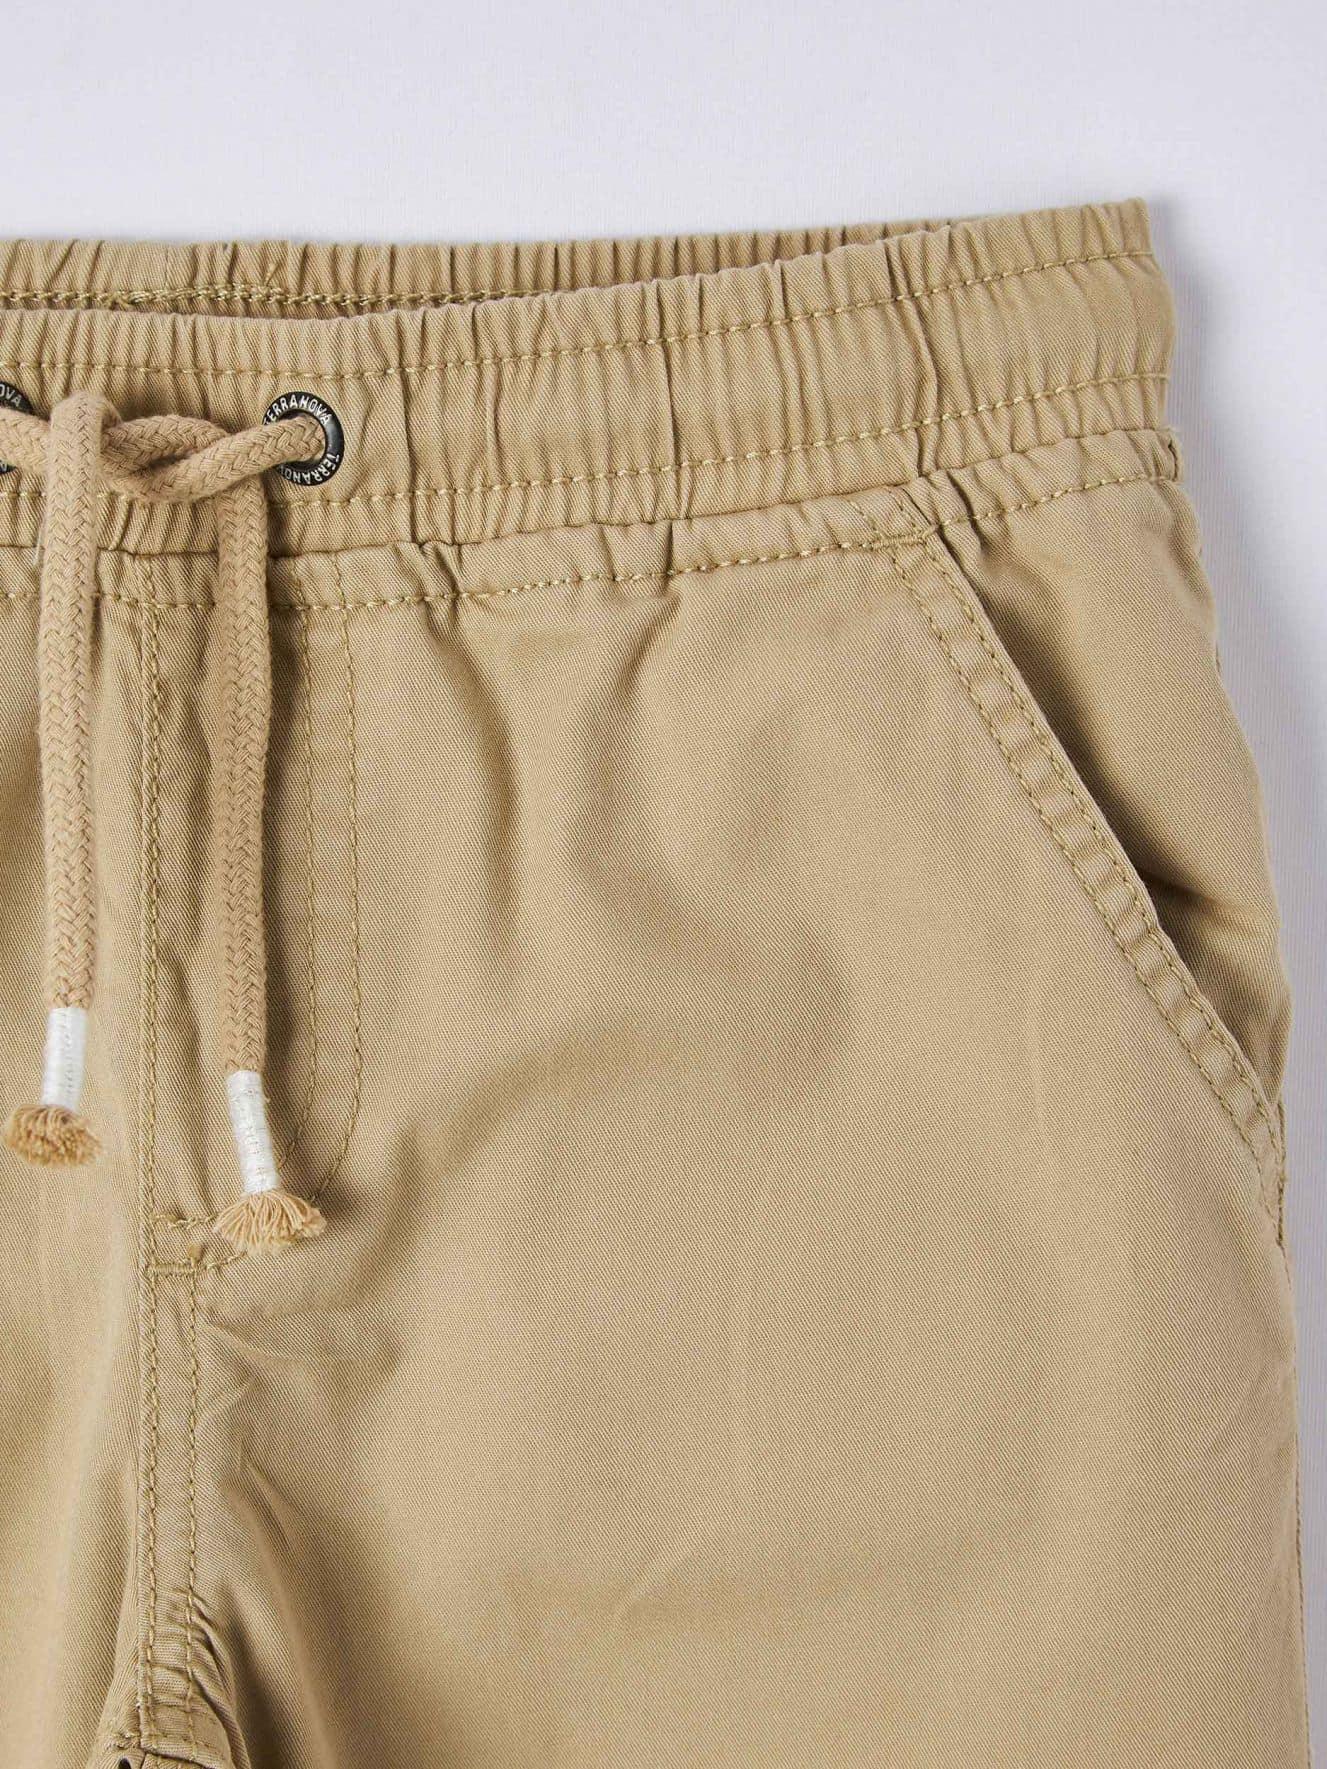 Pantalone Corto nino Terranova